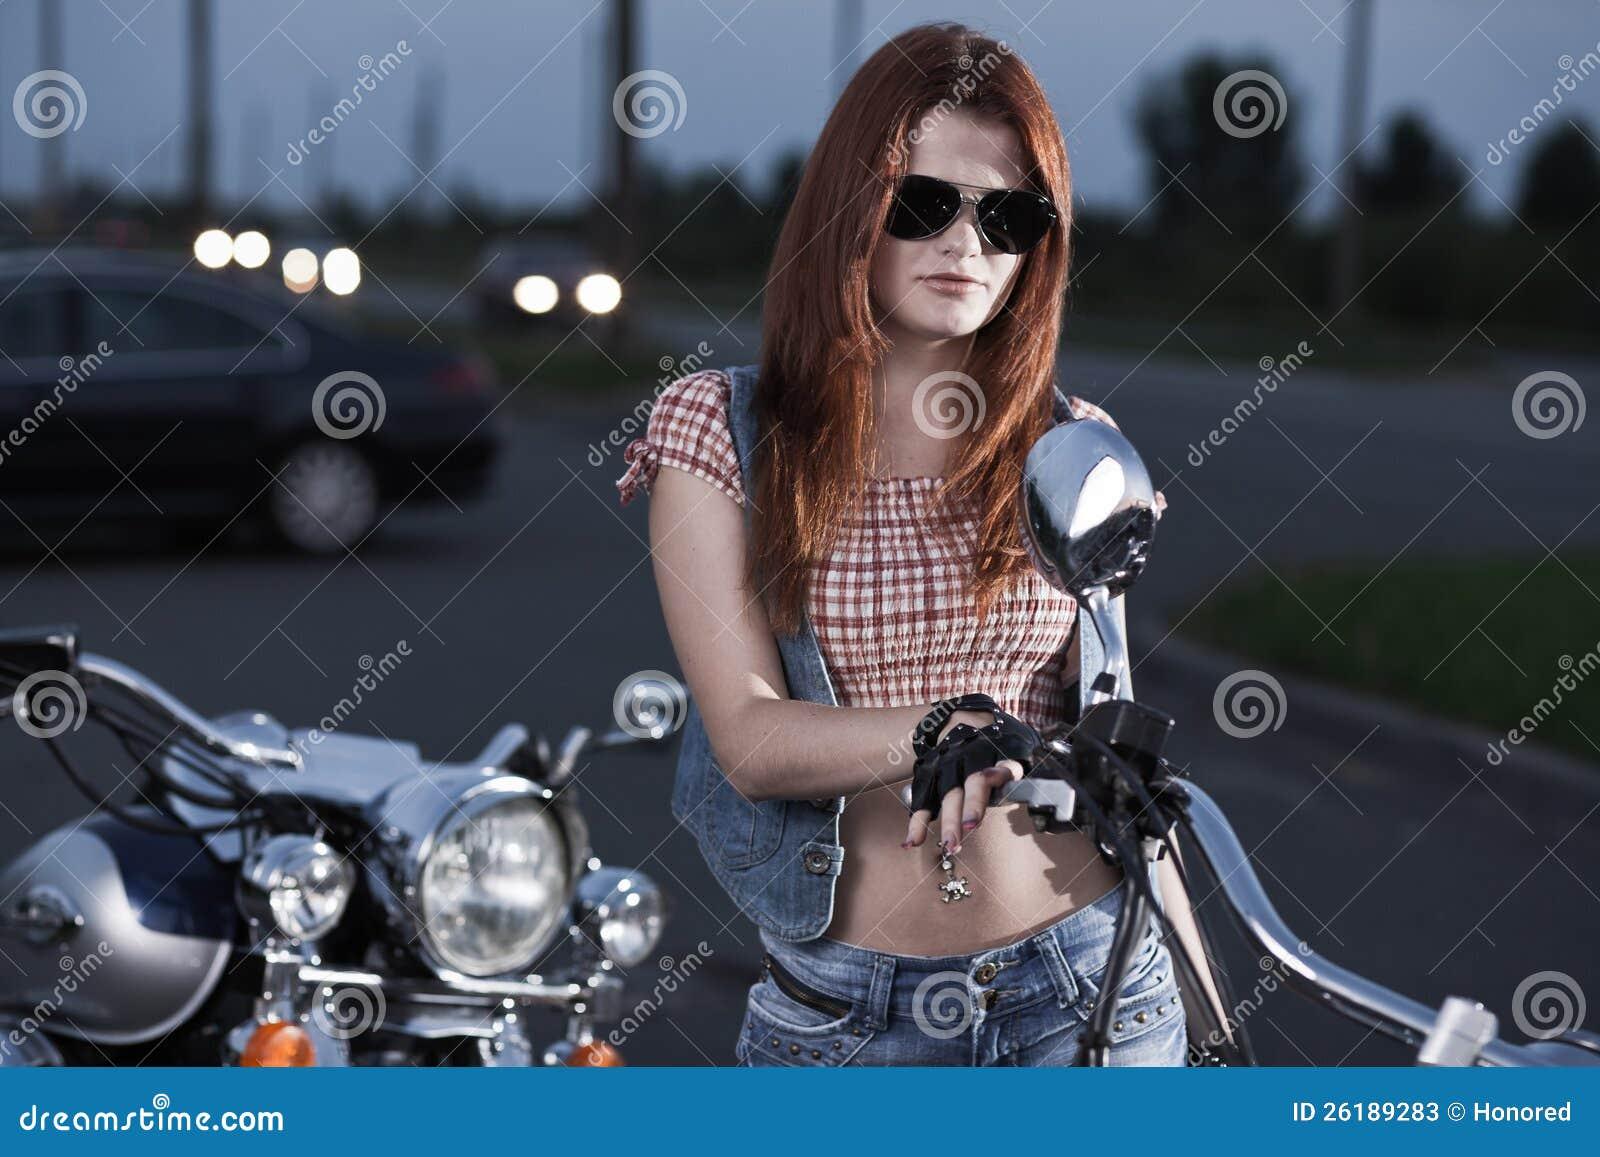 biker chicks Redhead